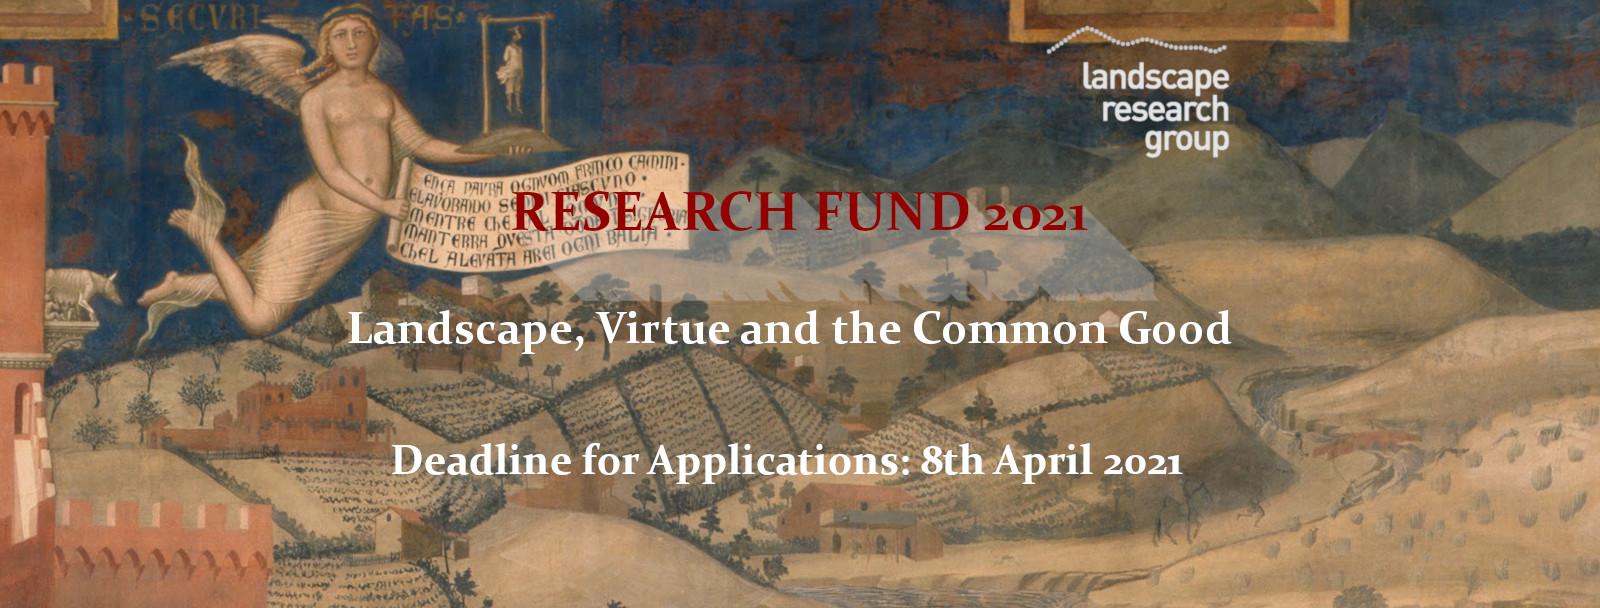 LRG Research Fund 2021